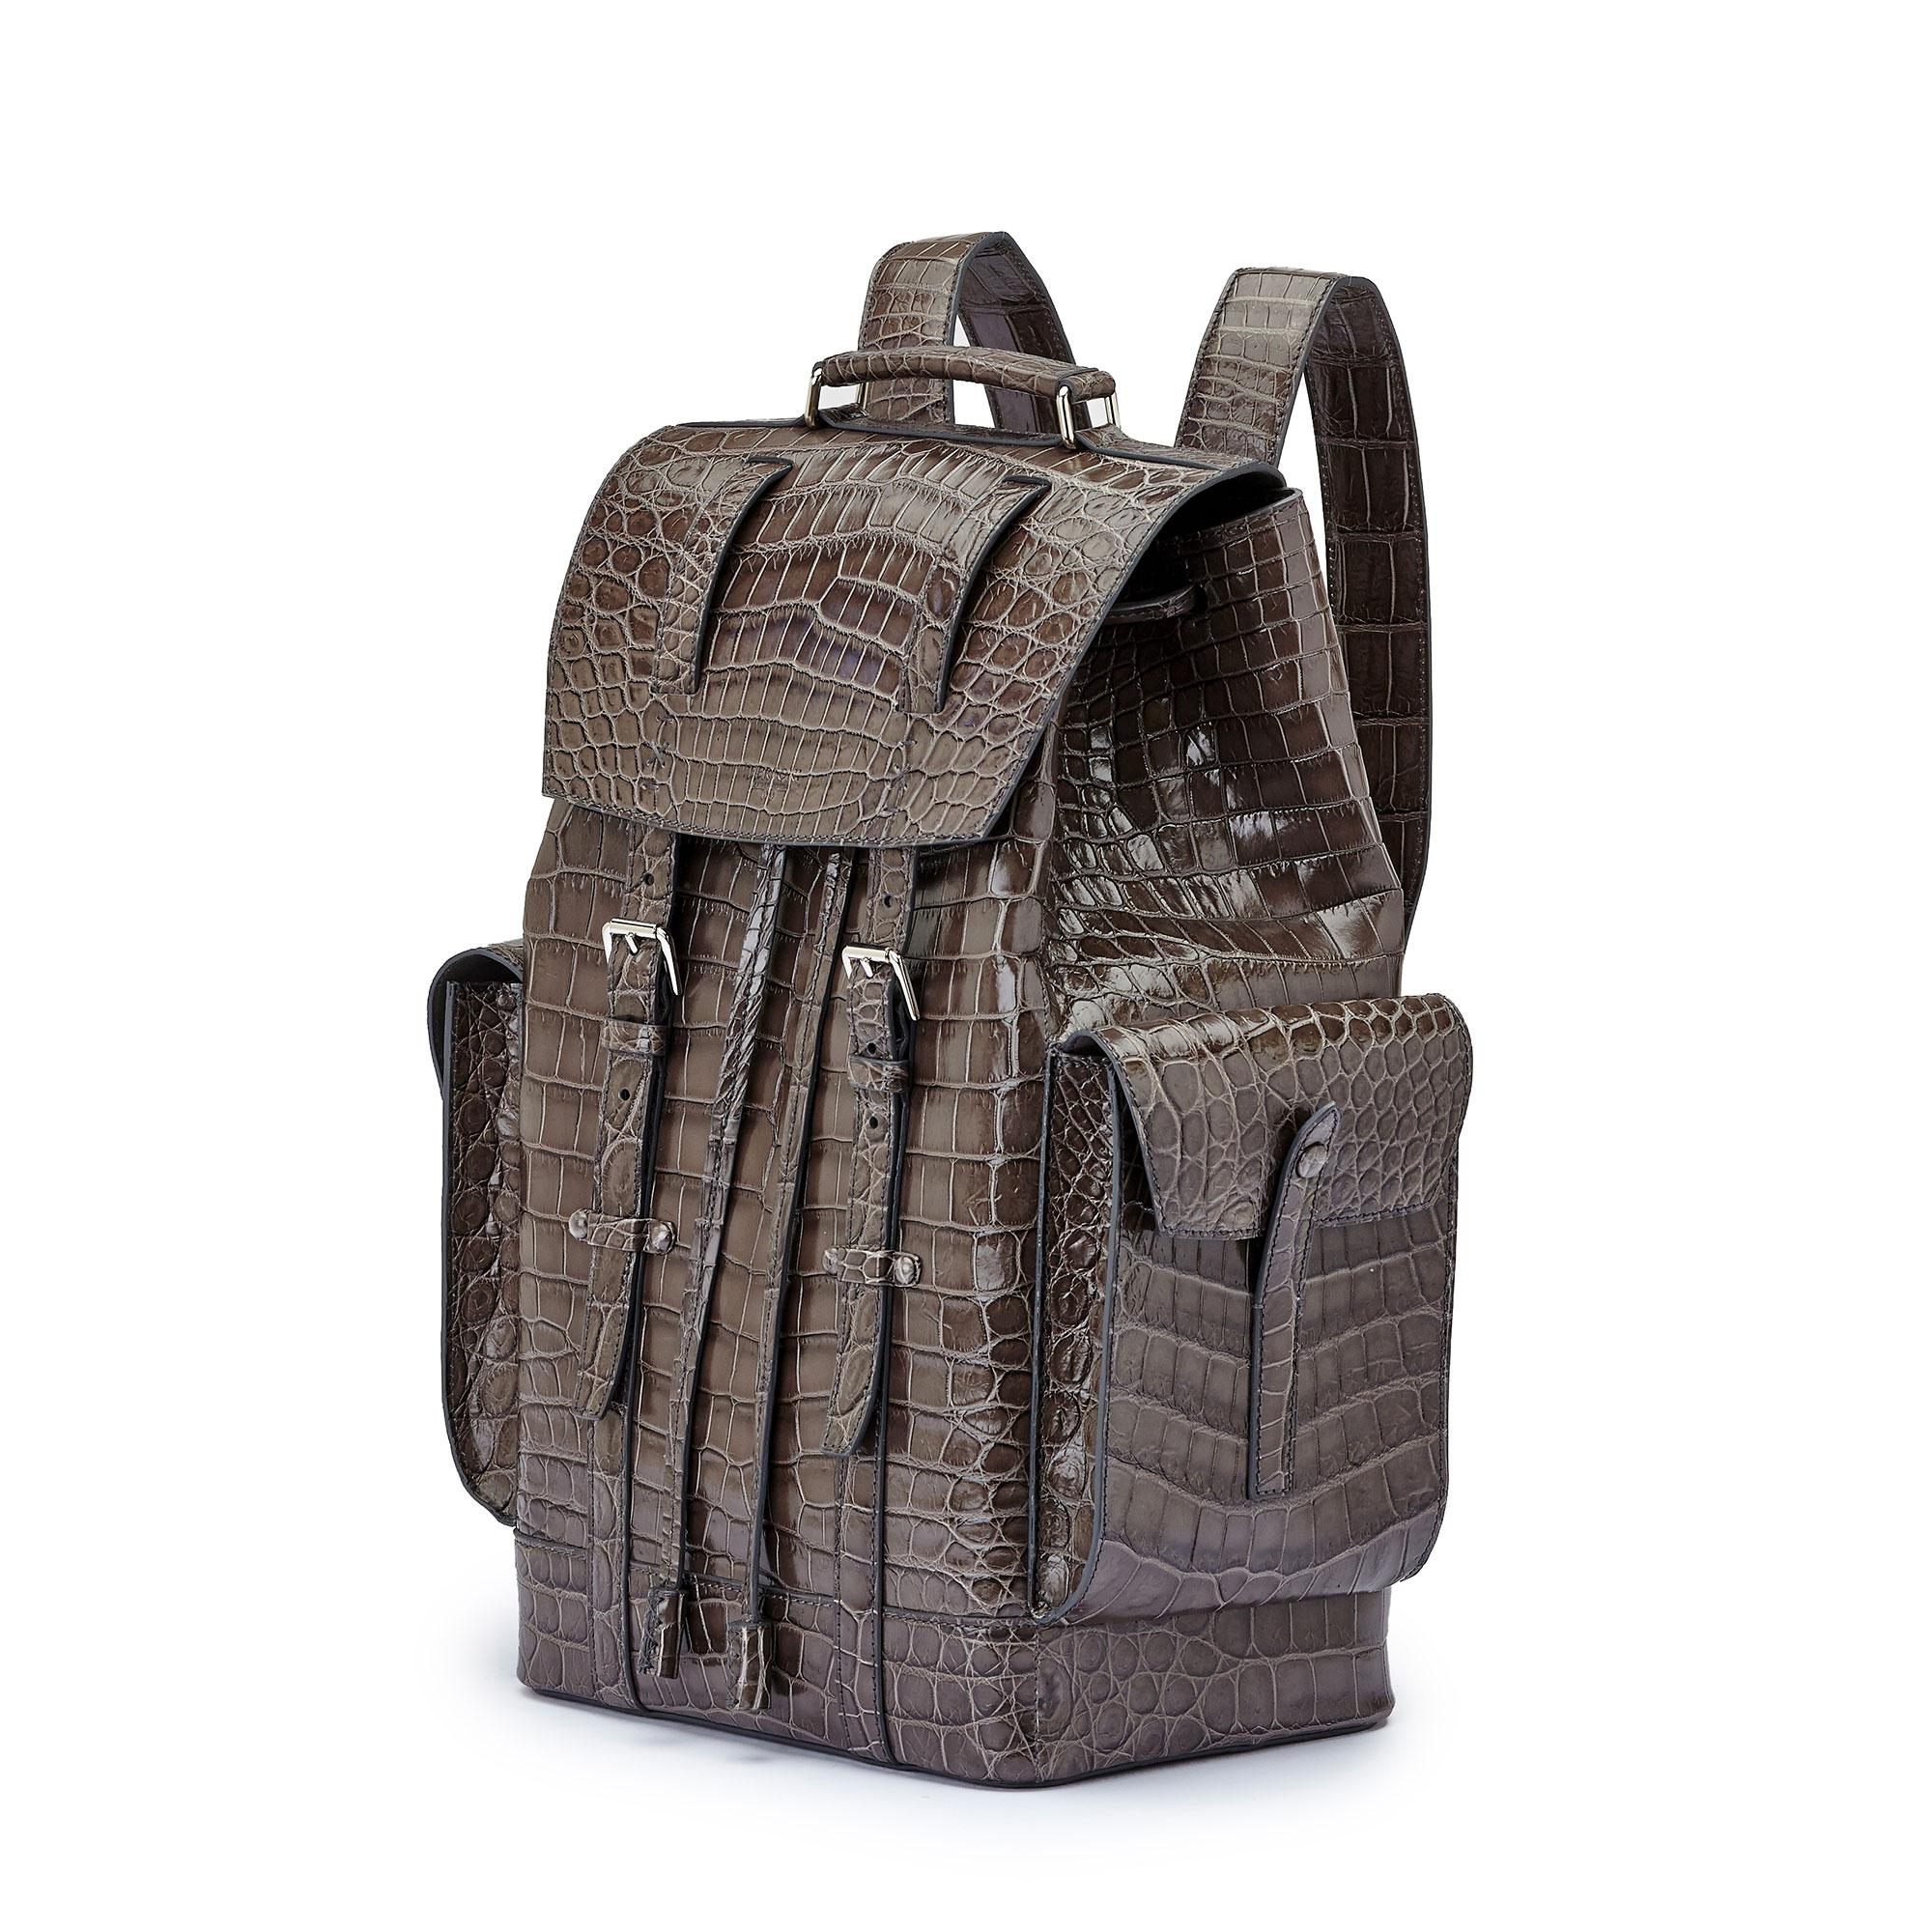 The grey alligator Traveller Backpack by Bertoni 1949 02